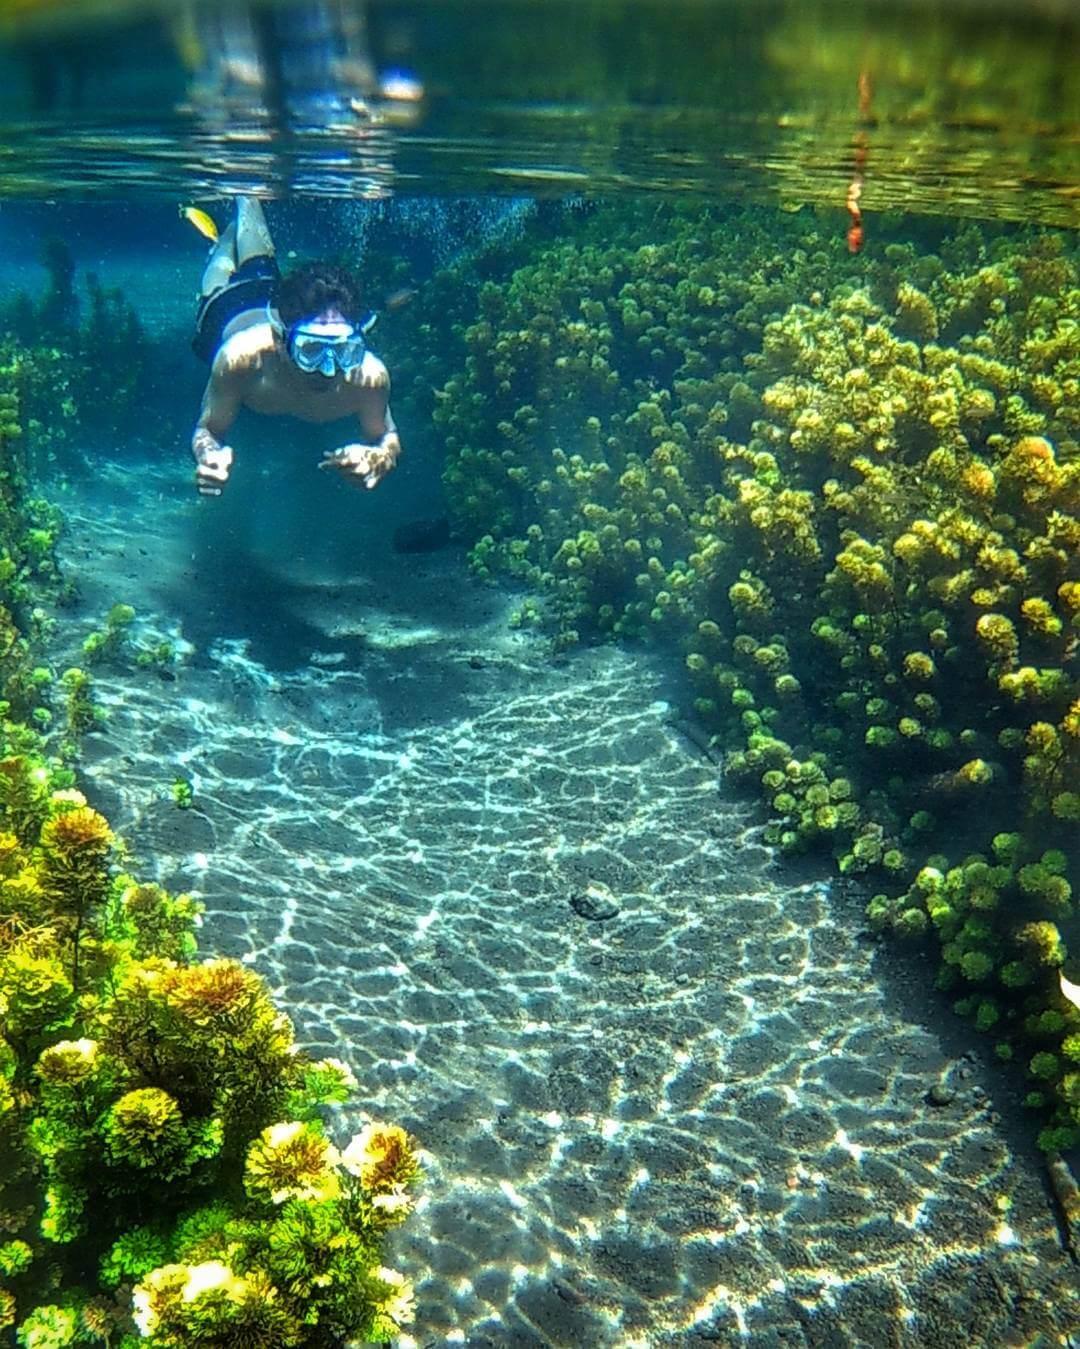 Sumber Sirah Gondanglegi Malang Surga Bawah Air Bening Kota